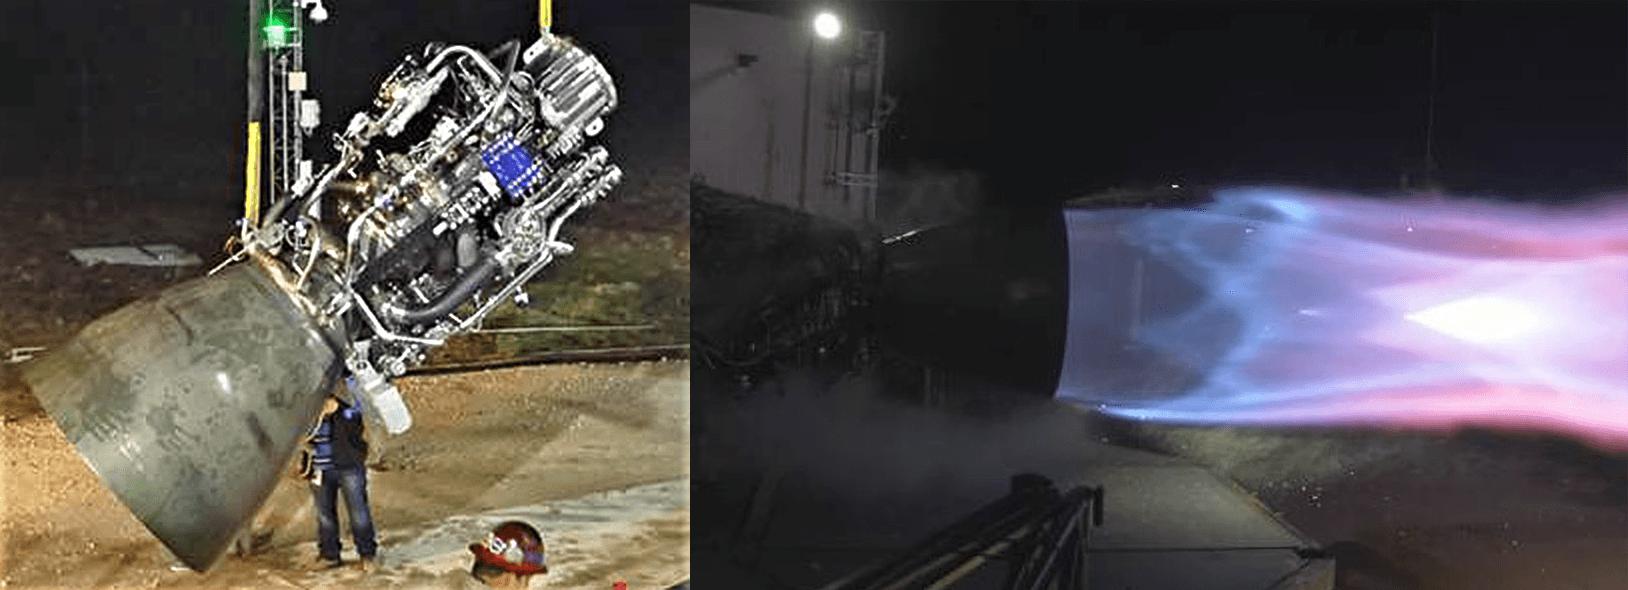 Raptor testing at McGregor Feb 2019 (SpaceX)